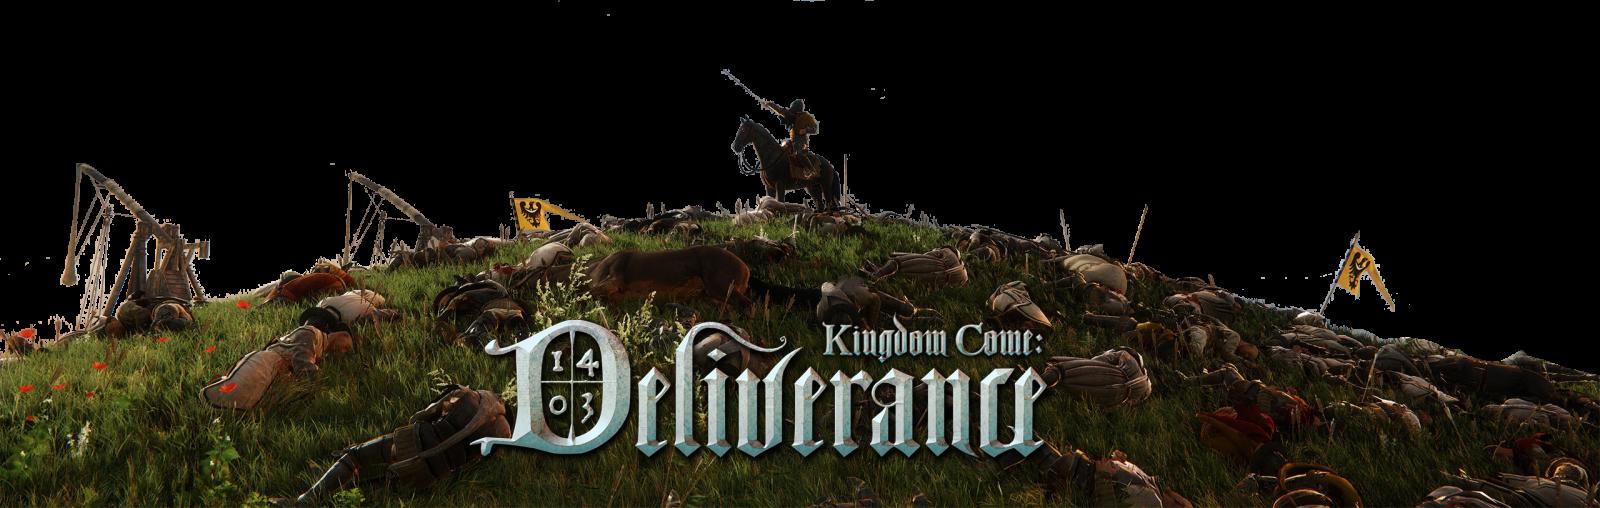 Kingdom-come-deliverance-entrevista-interview